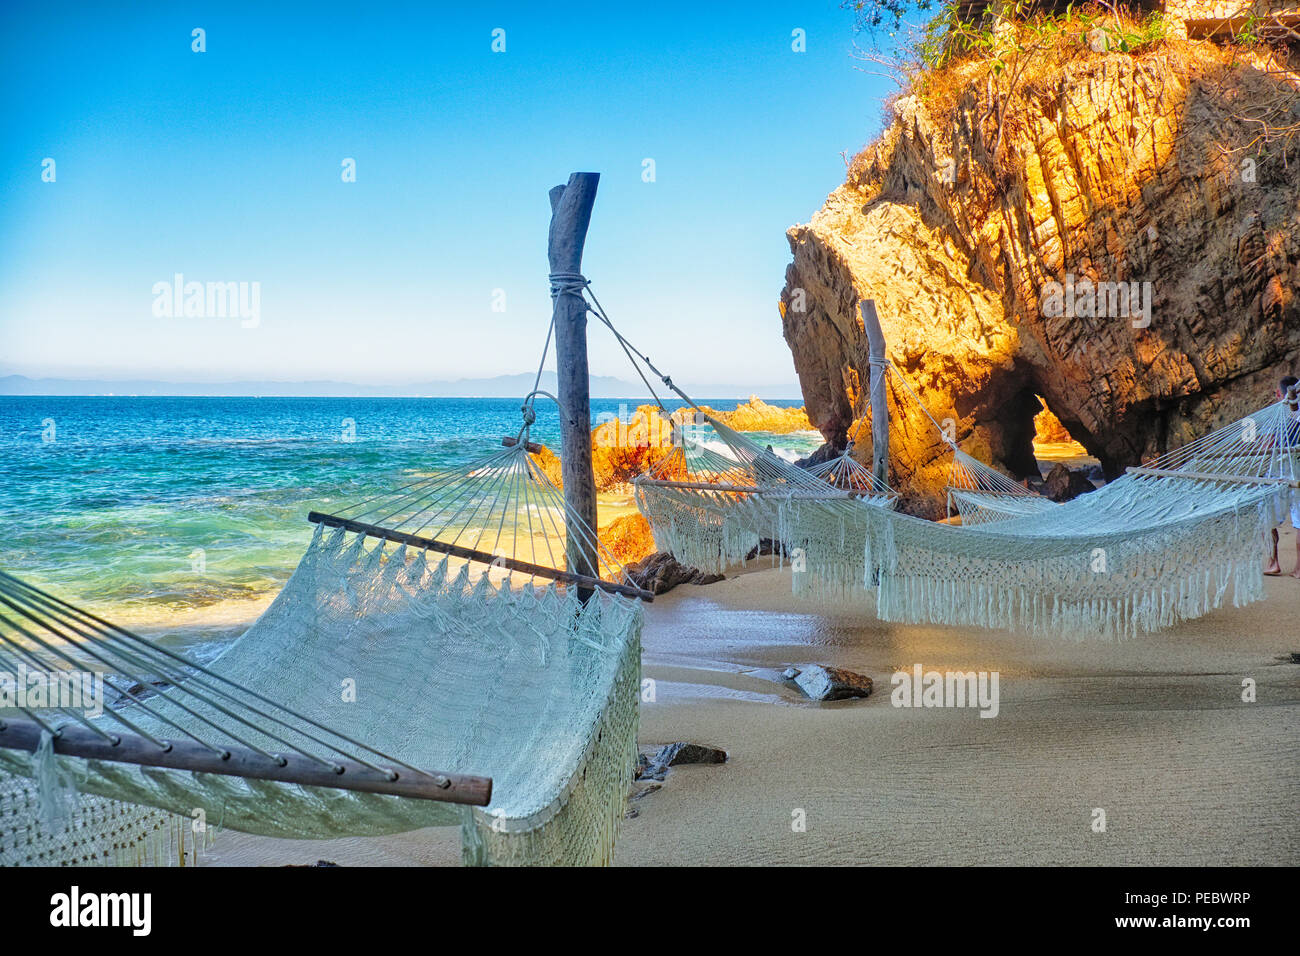 Hammocks in a the Shade on a Tropical Beach Hideway, Las Calitas, Jalisco, Mexico - Stock Image